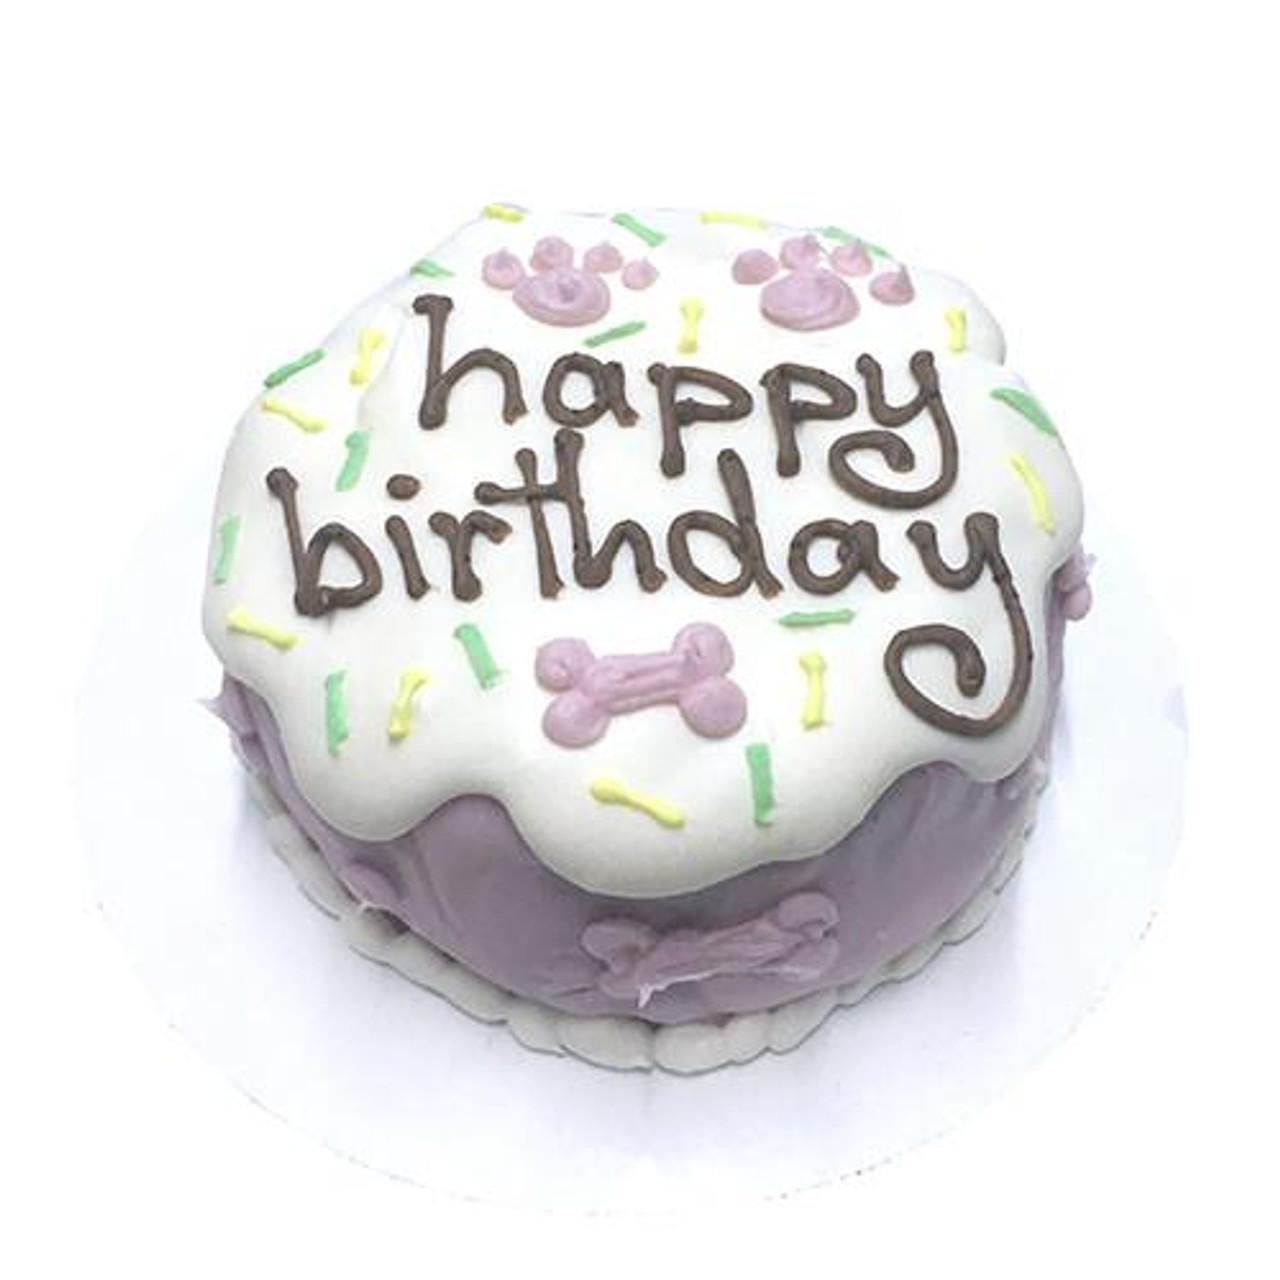 Swell Customized Sprinkle Birthday Cakes For Dogs Pink Organic Dog Treats Funny Birthday Cards Online Benoljebrpdamsfinfo